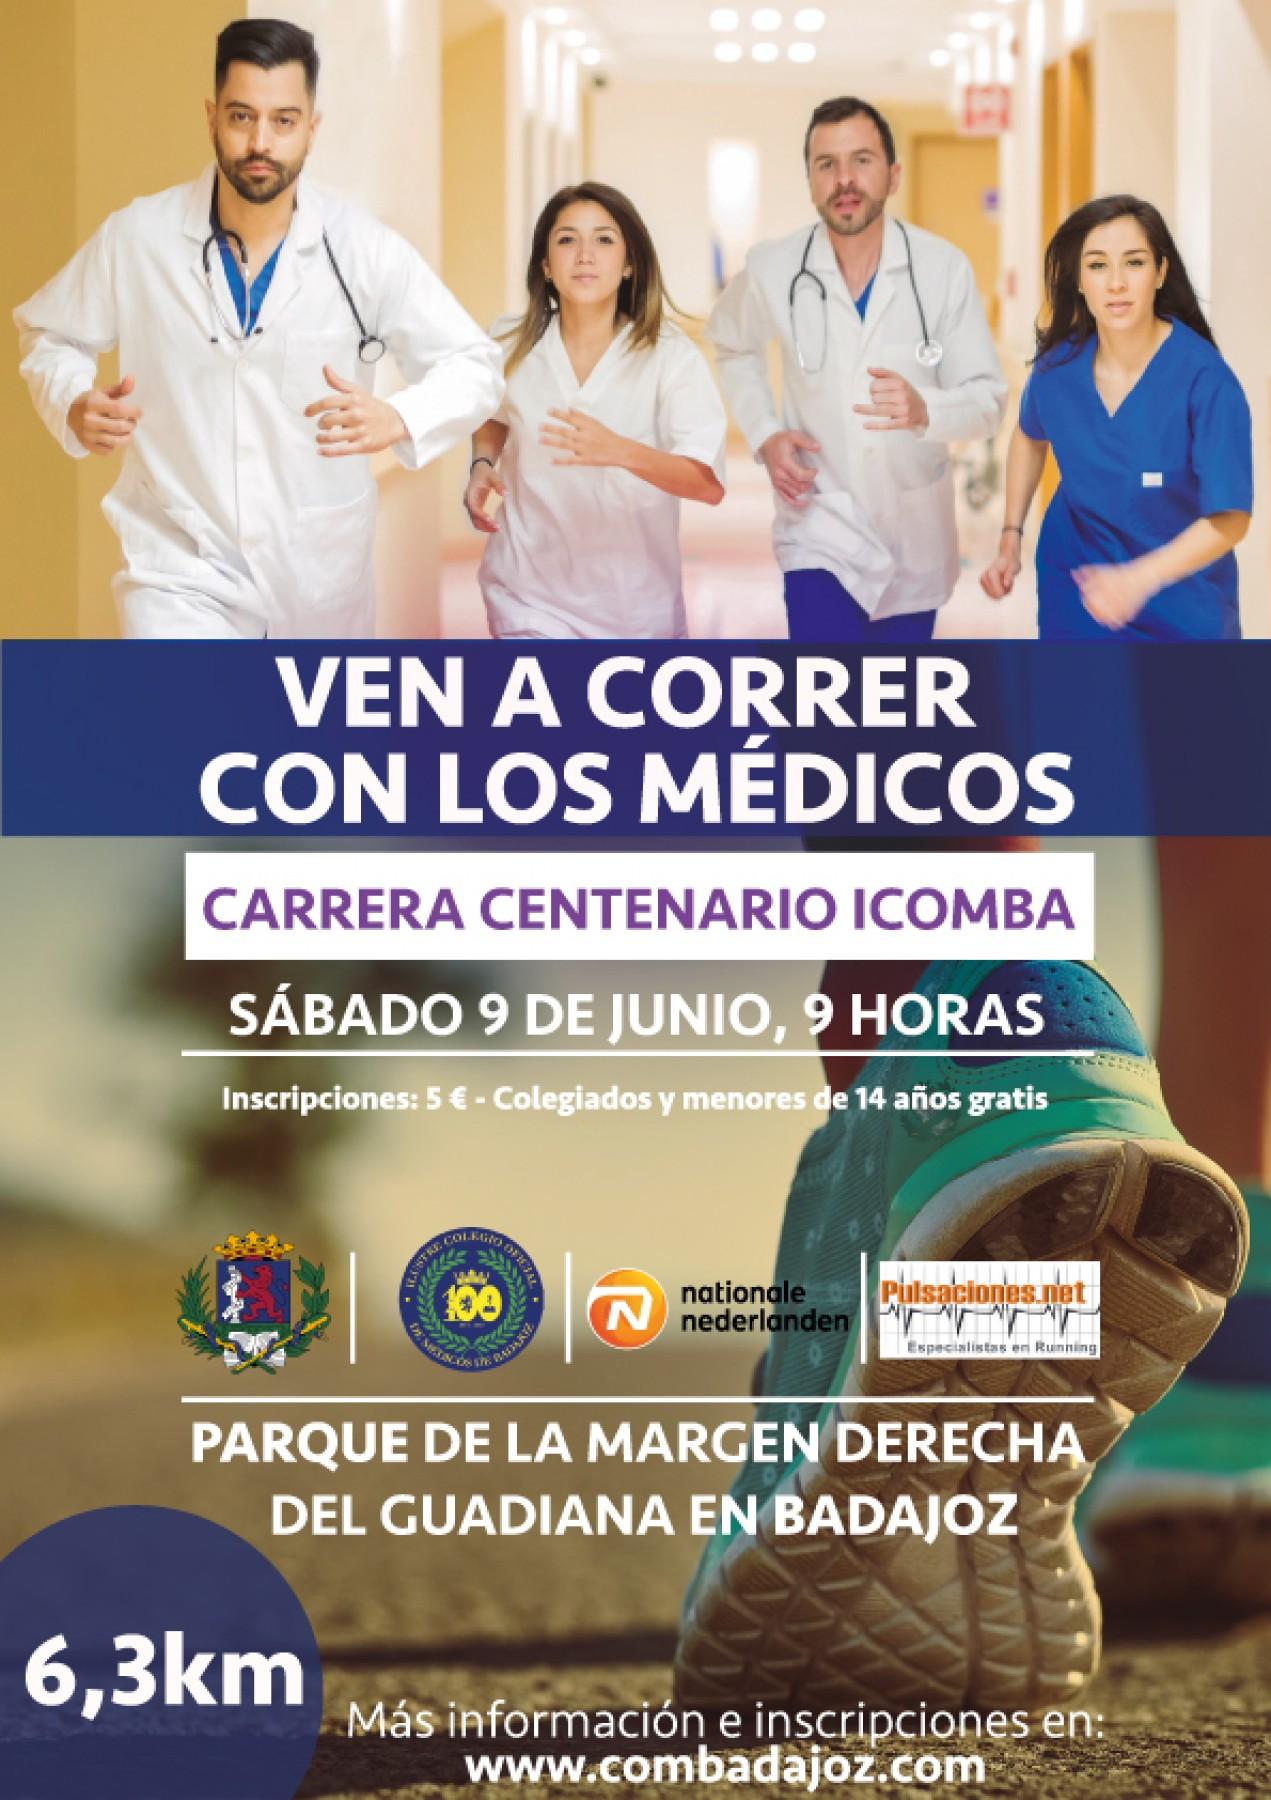 CARRERA CENTENARIO ICOMBA